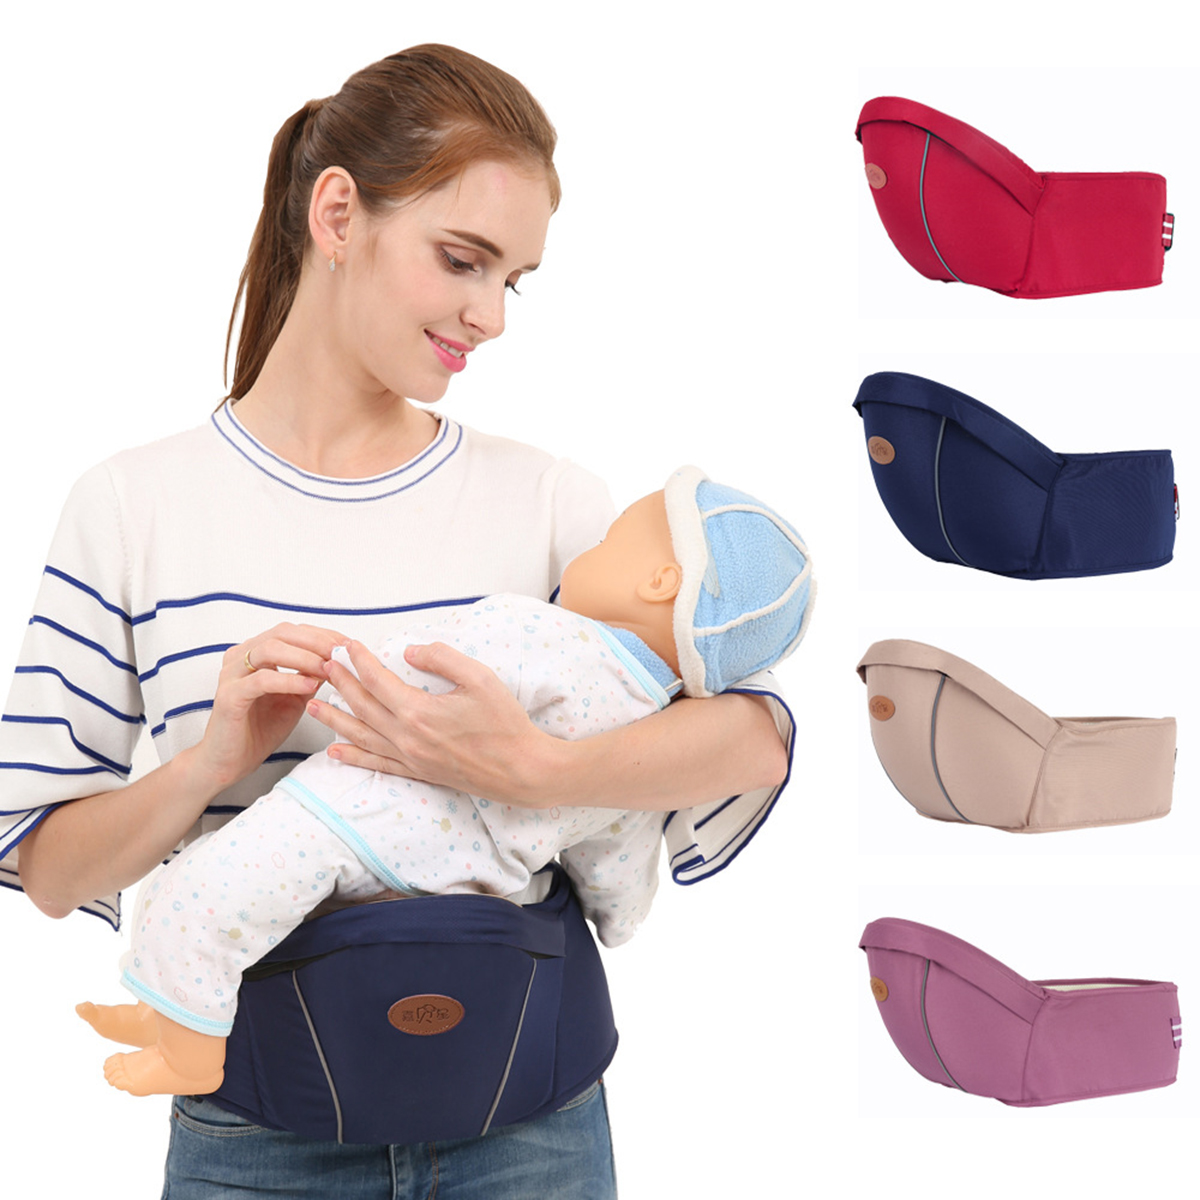 Puseky Baby Carrier Waist Stool Walkers Baby Sling Hold Waist Belt Backpack Hipseat Belt Kids Infant Hip Seat New